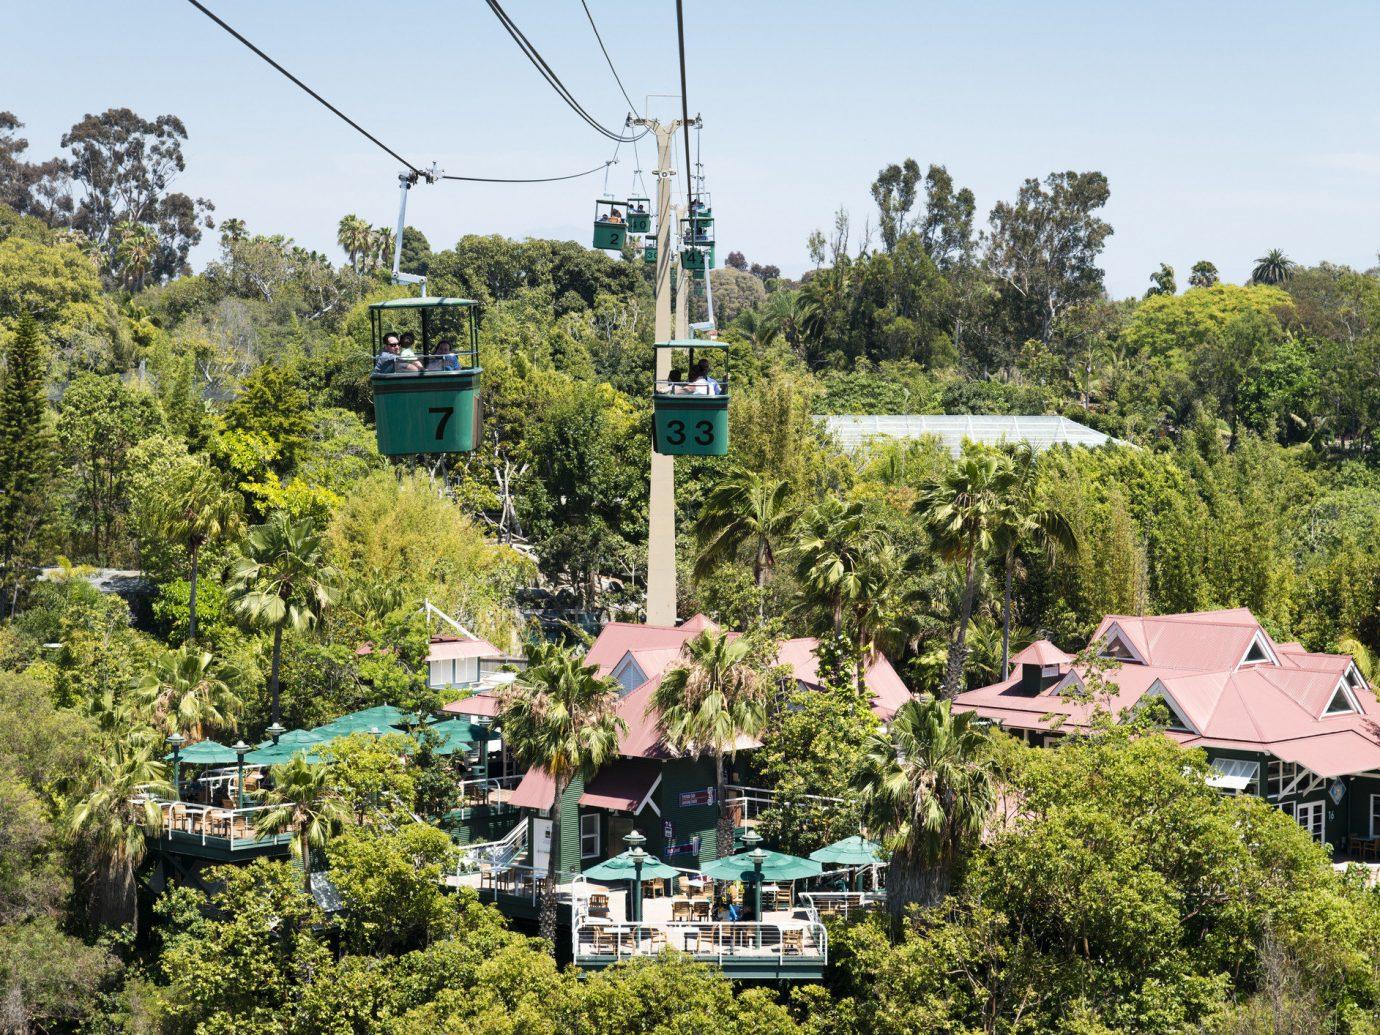 Family Travel Trip Ideas Weekend Getaways tree outdoor sky Town human settlement residential area flower Garden park traveling day